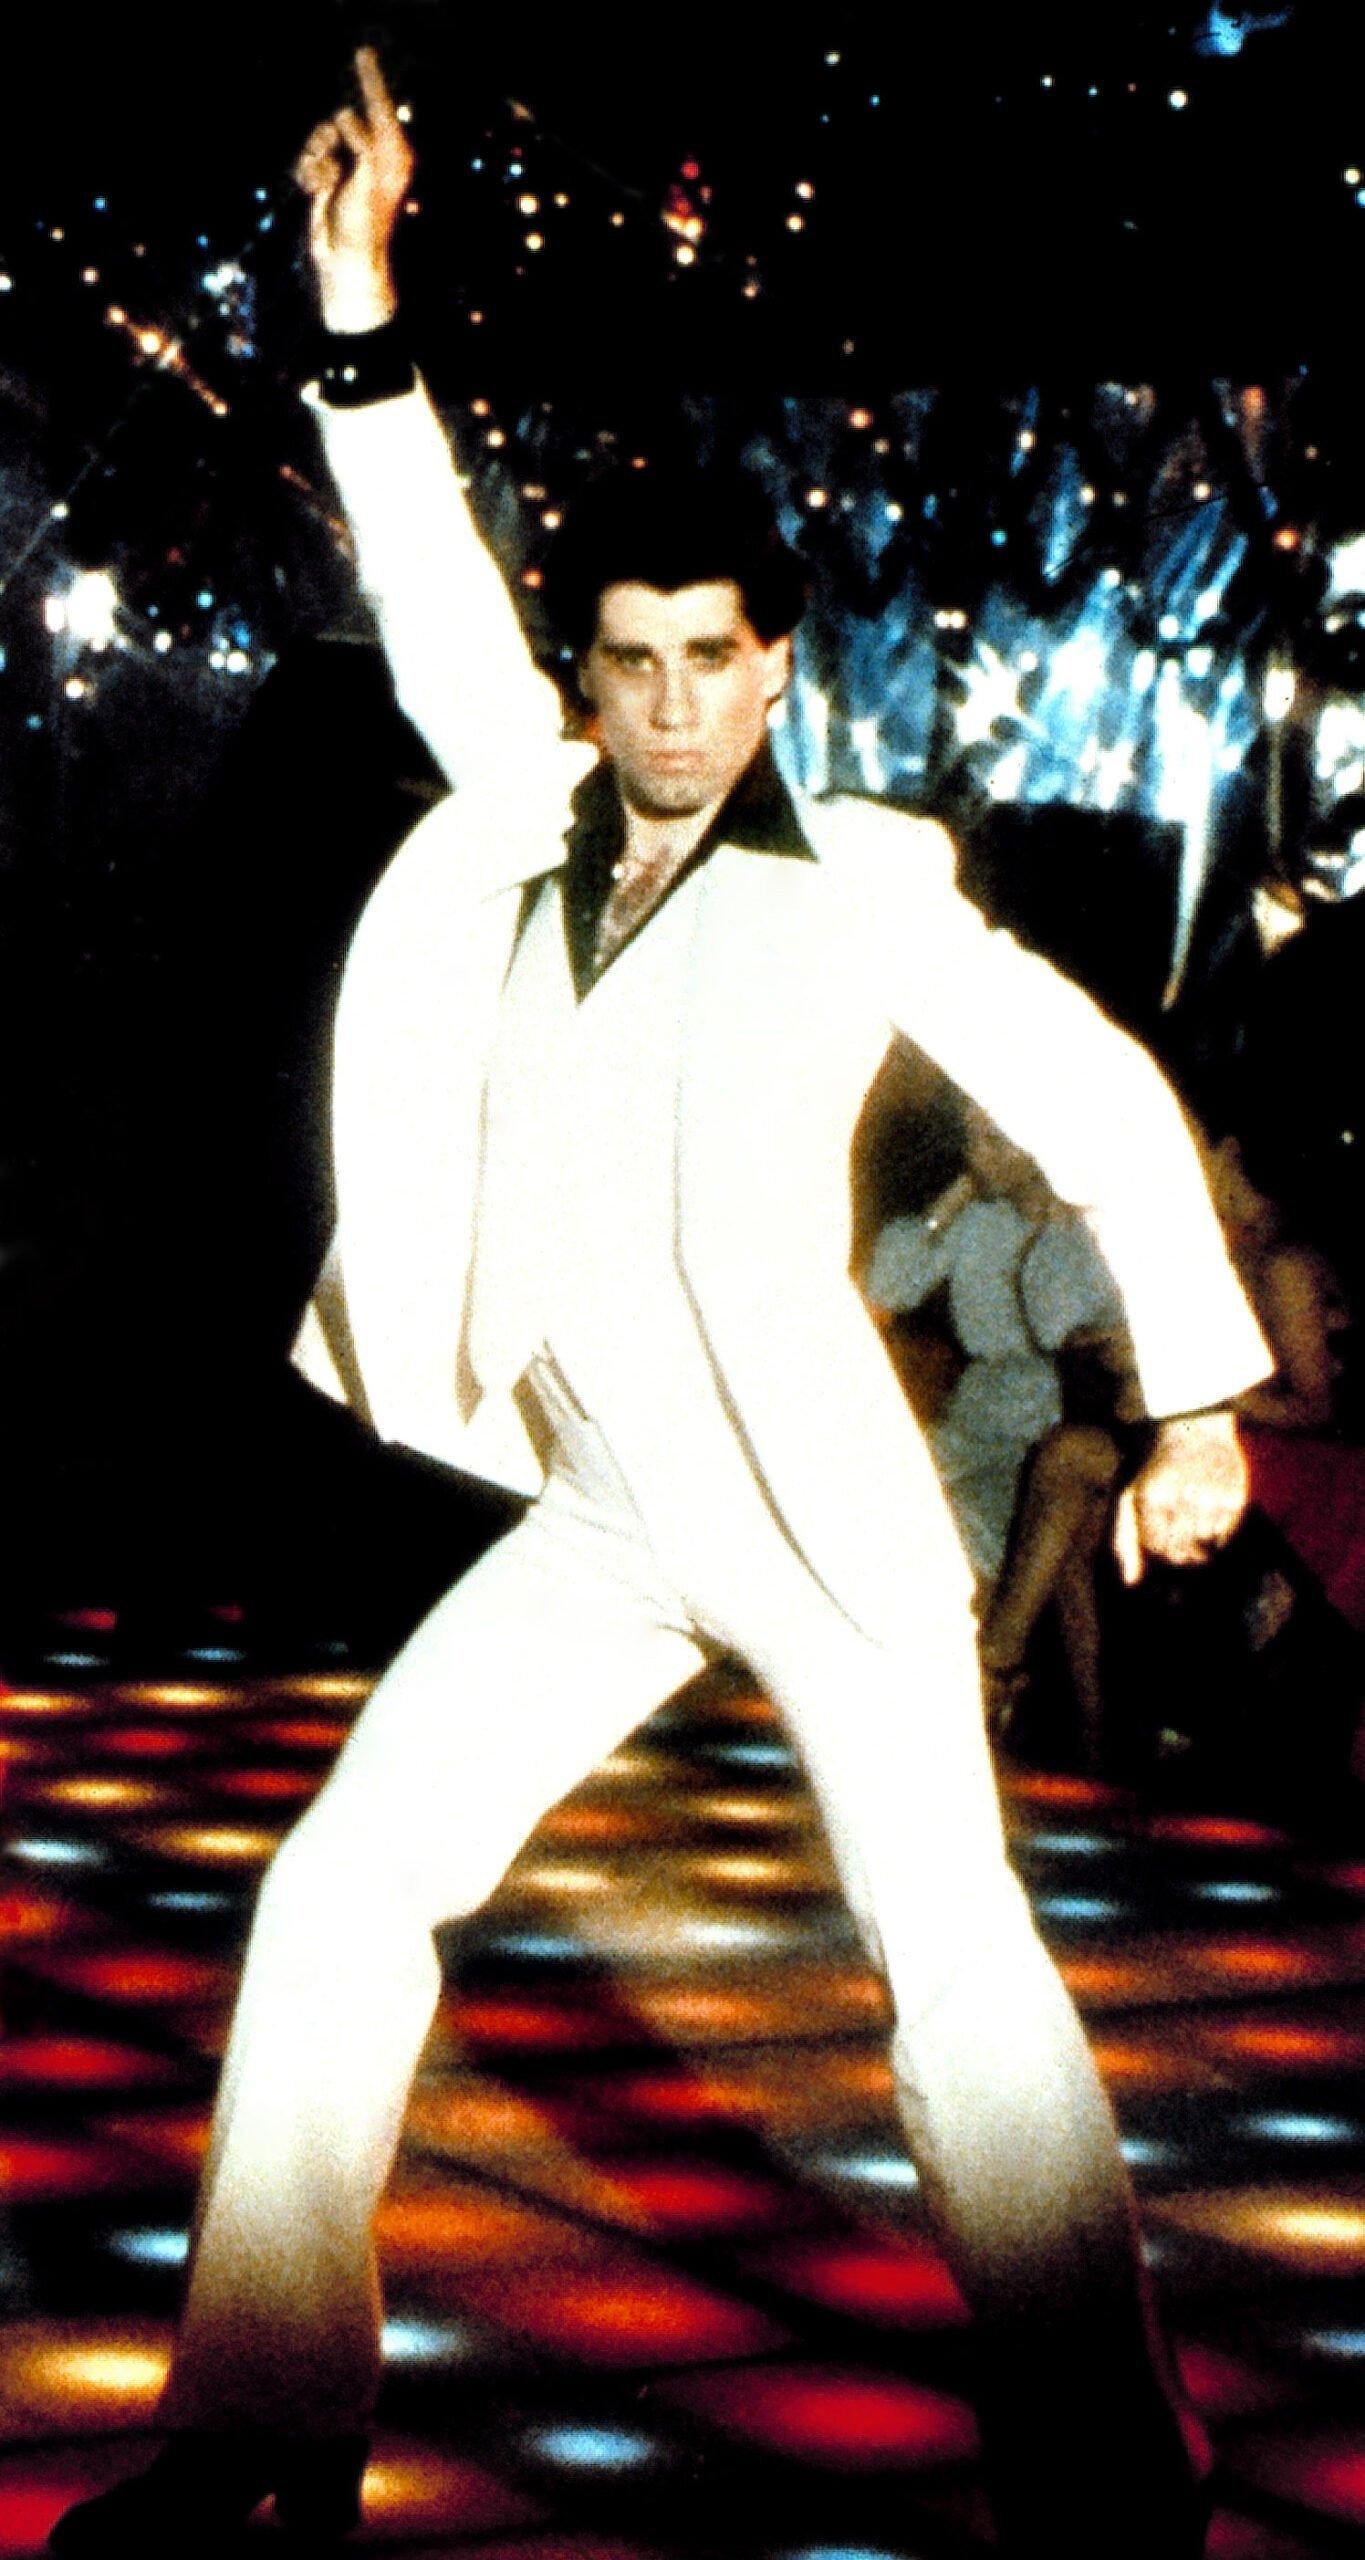 disco finger john travolta saturday night fever